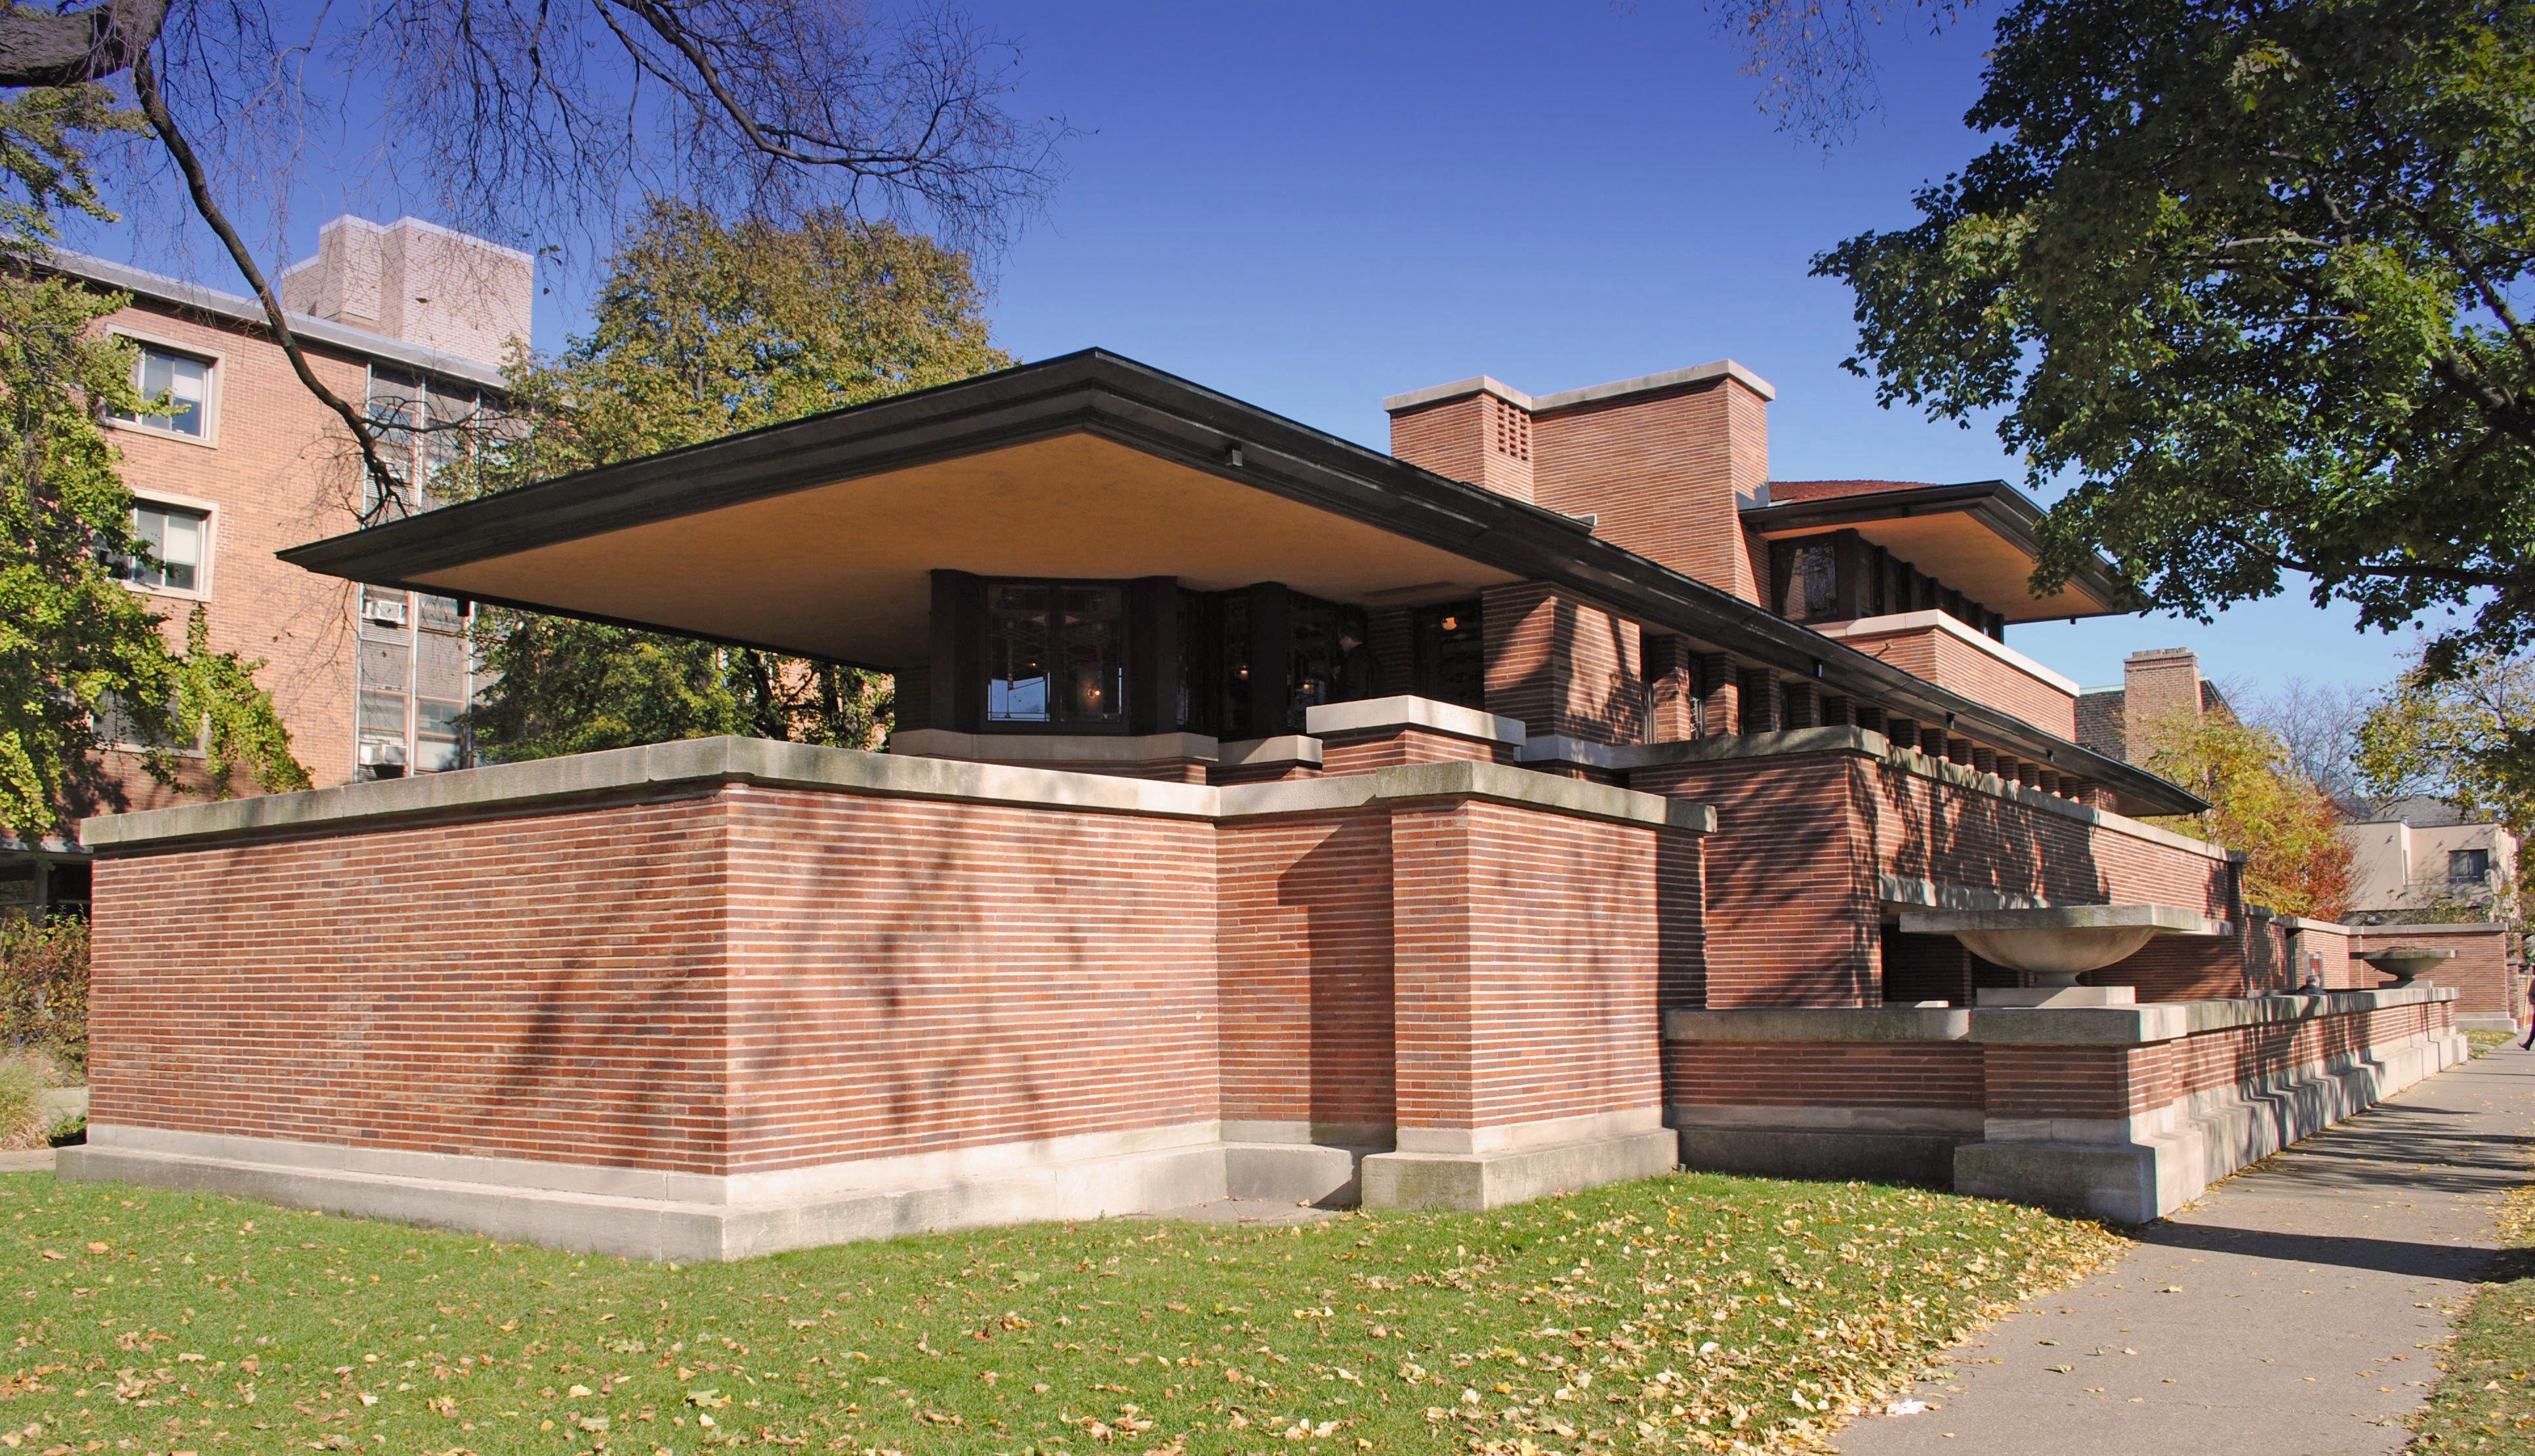 Frank Lloyd Wright Robie House Hyde Park Chicago 1909 Frank Lloyd Wright Architecture Robie House Frank Lloyd Wright Robie House